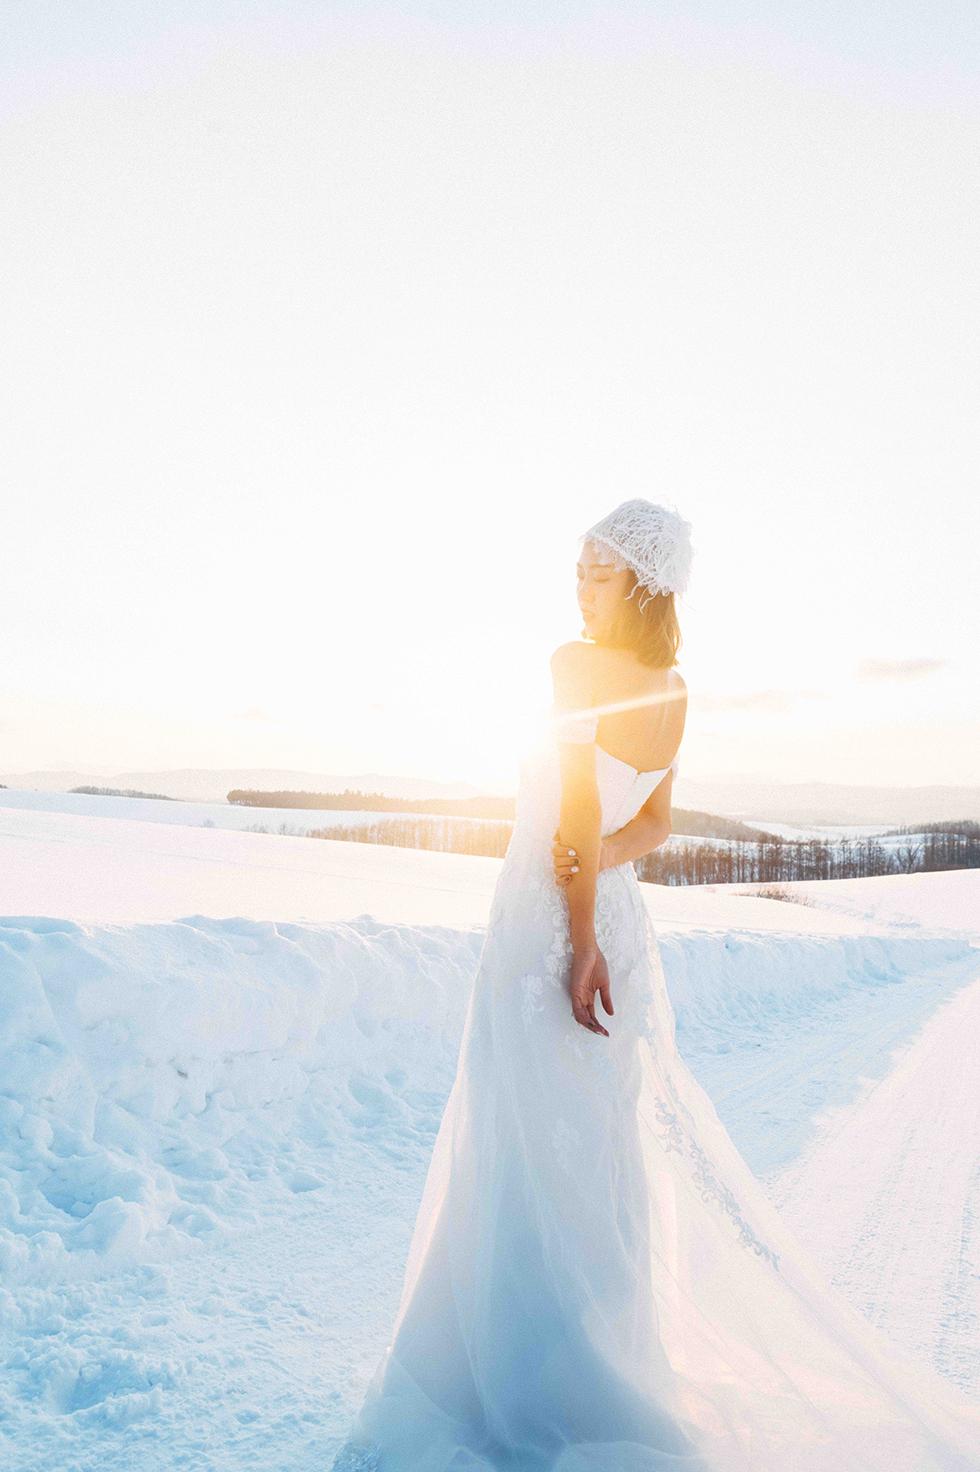 %255BHokkaido%255D%2BGUI047- 婚攝, 婚禮攝影, 婚紗包套, 婚禮紀錄, 親子寫真, 美式婚紗攝影, 自助婚紗, 小資婚紗, 婚攝推薦, 家庭寫真, 孕婦寫真, 顏氏牧場婚攝, 林酒店婚攝, 萊特薇庭婚攝, 婚攝推薦, 婚紗婚攝, 婚紗攝影, 婚禮攝影推薦, 自助婚紗